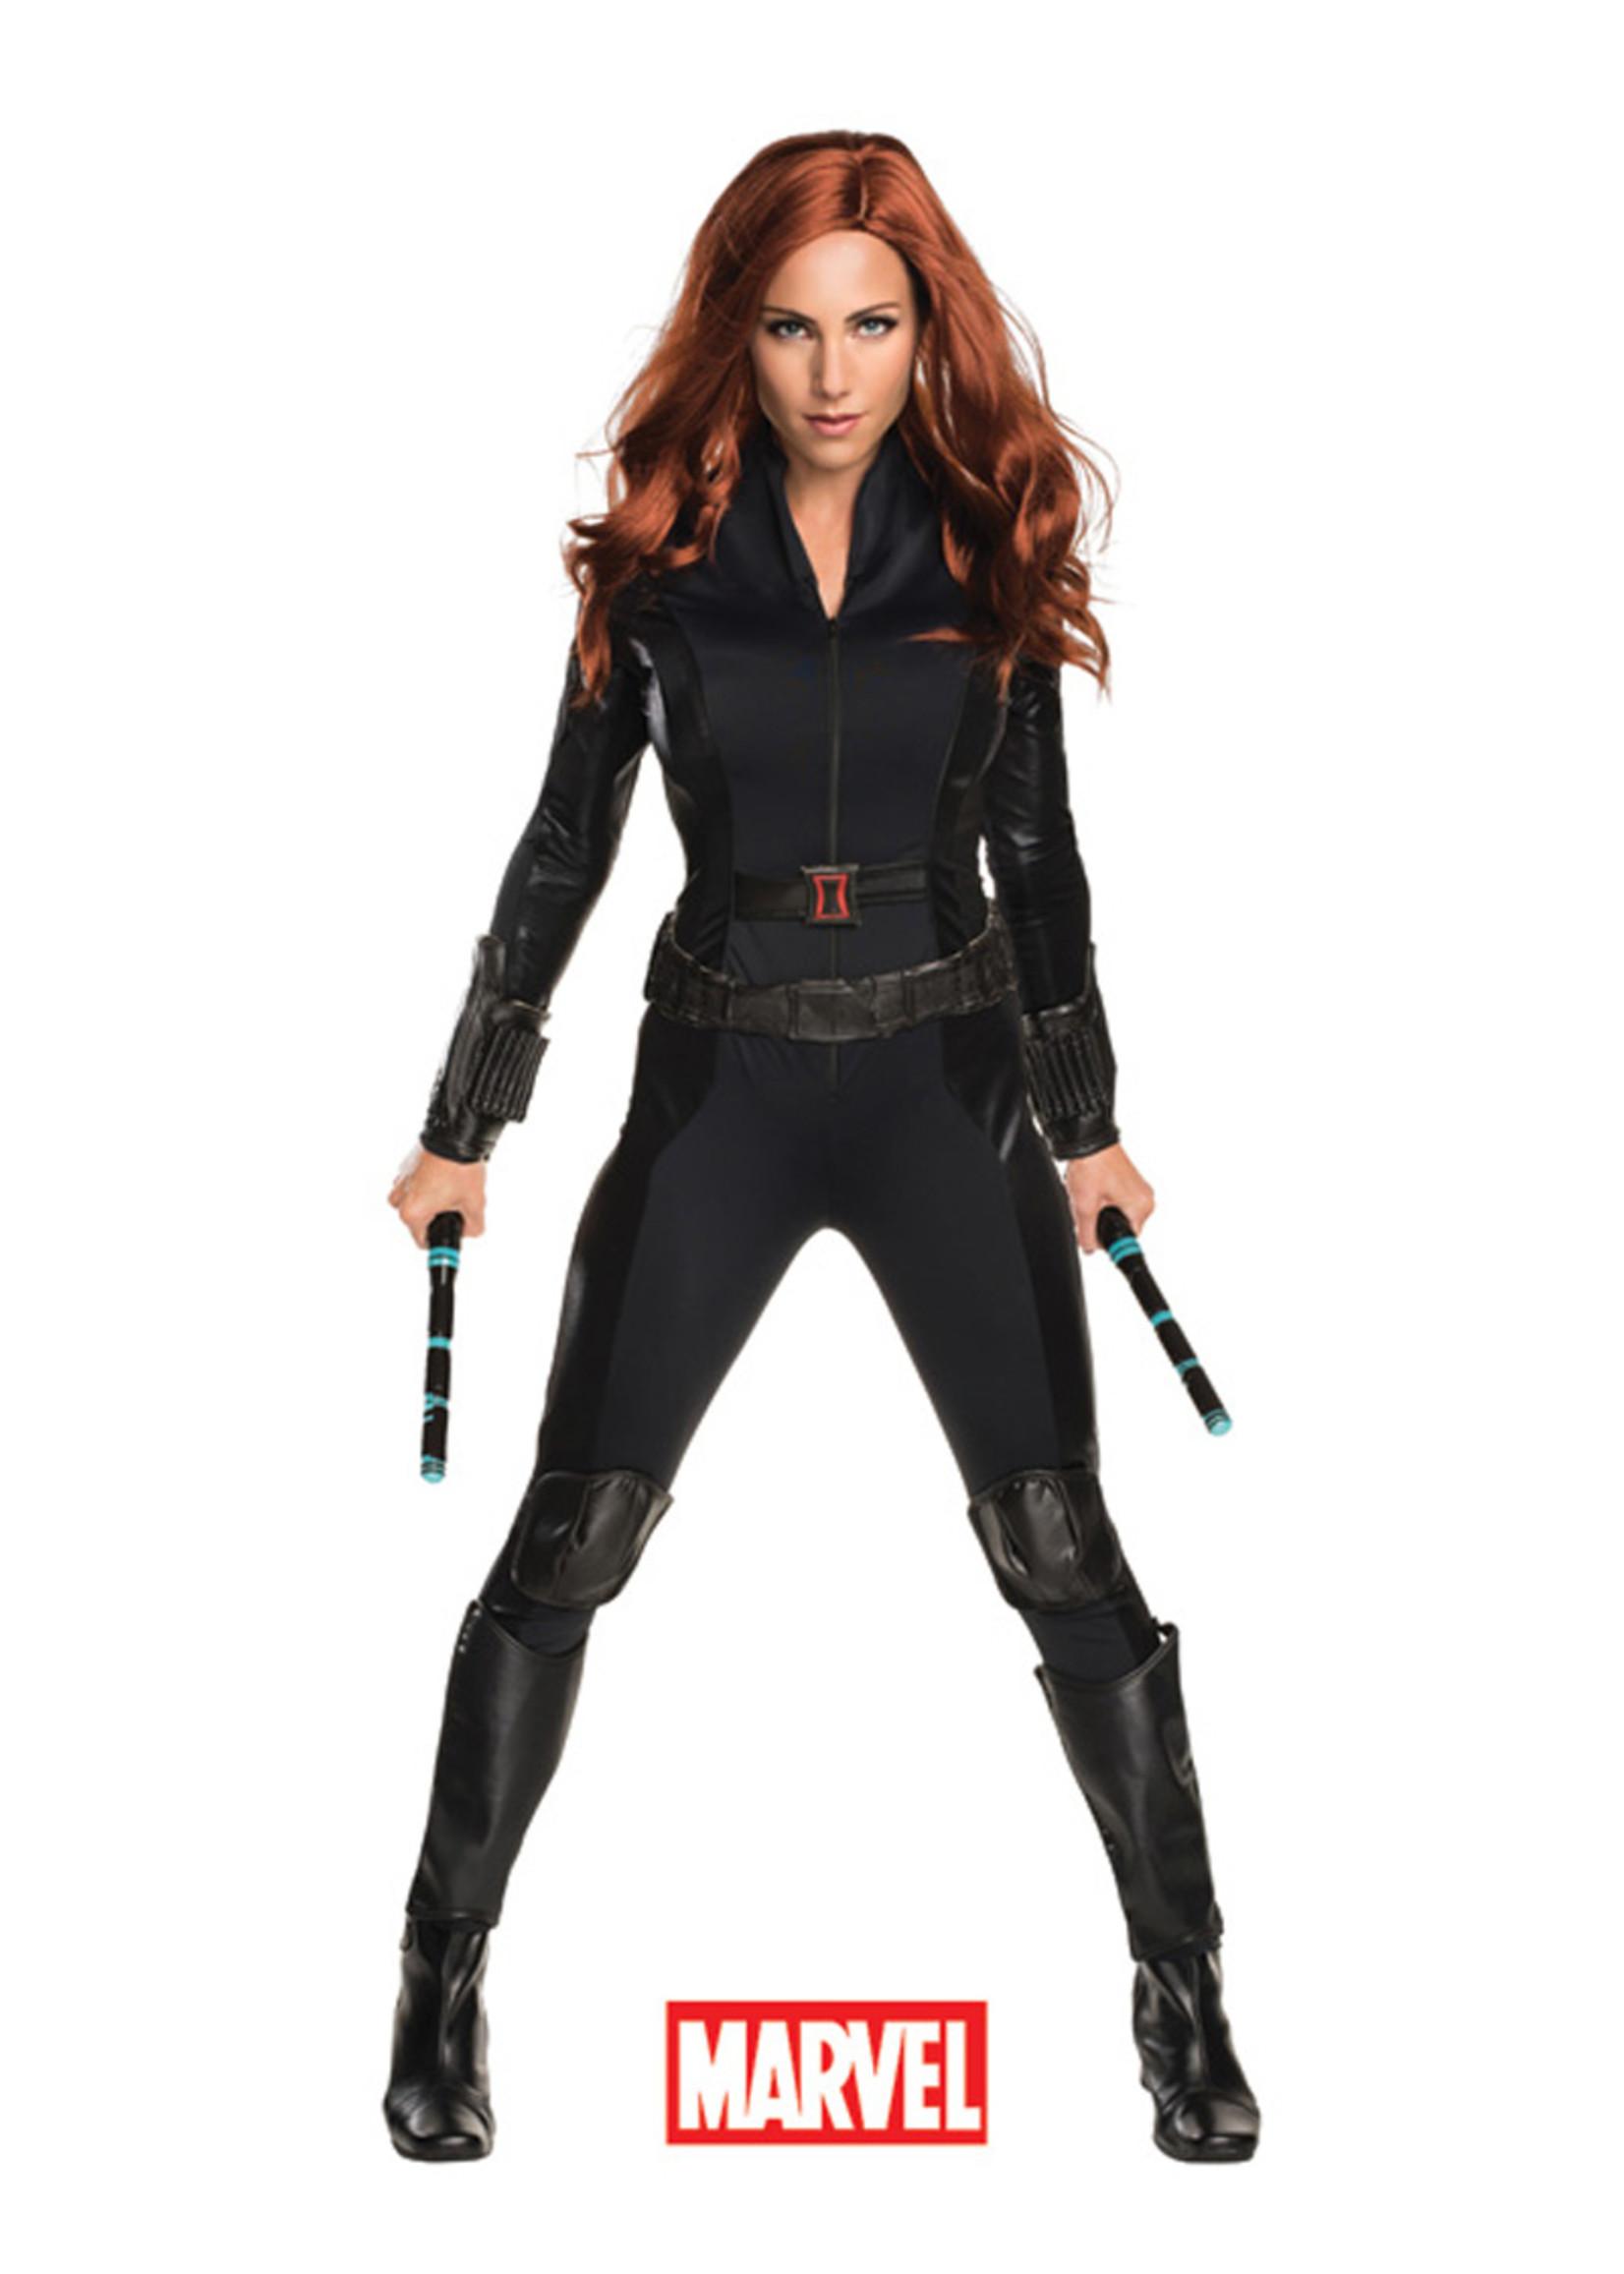 Black Widow - Civil War Costume - Women's